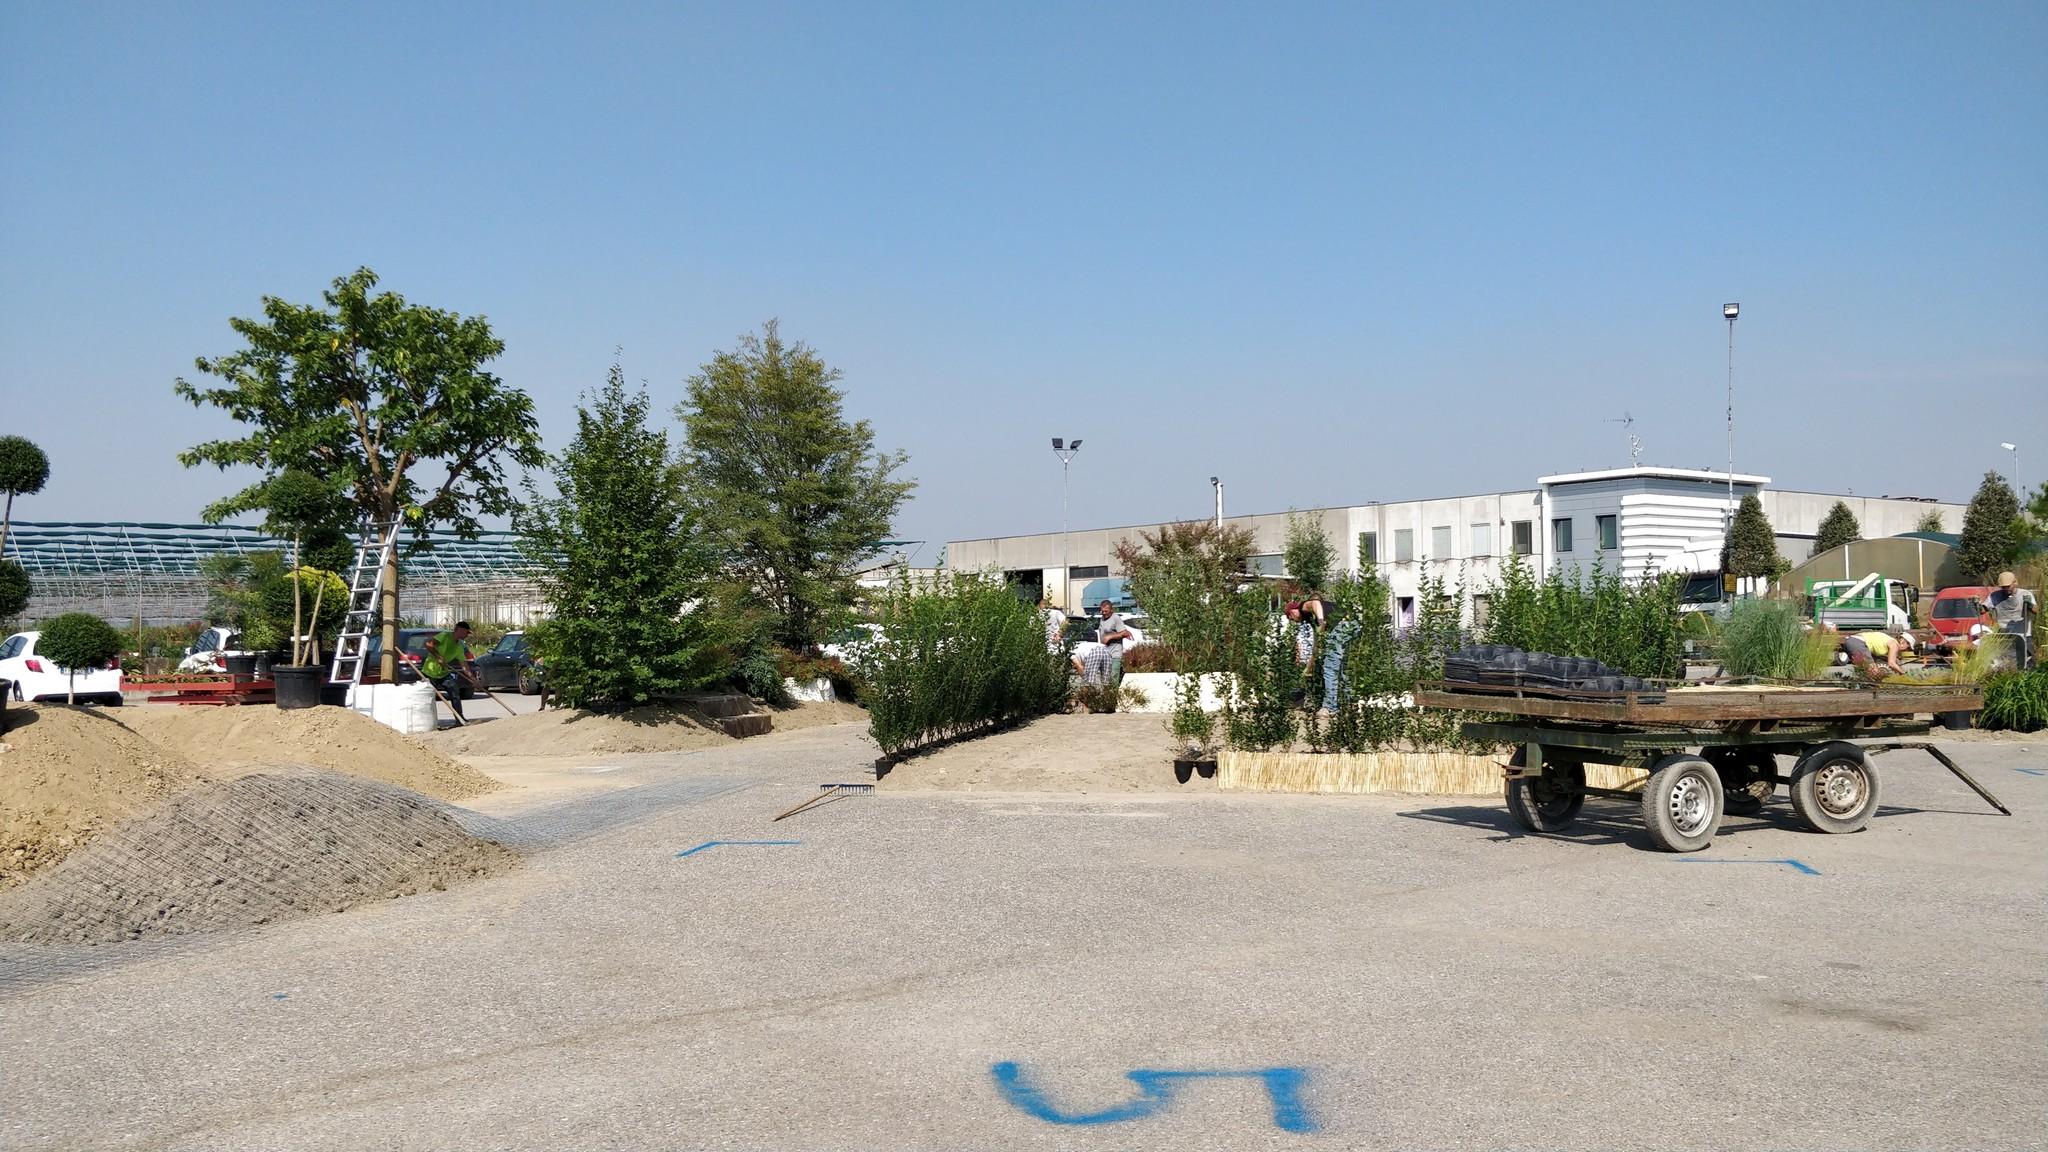 Concorso giardini Verdeggiando_12 Sentiero italiano (HS194) Frontini Giovanni-Hortus Simplicium